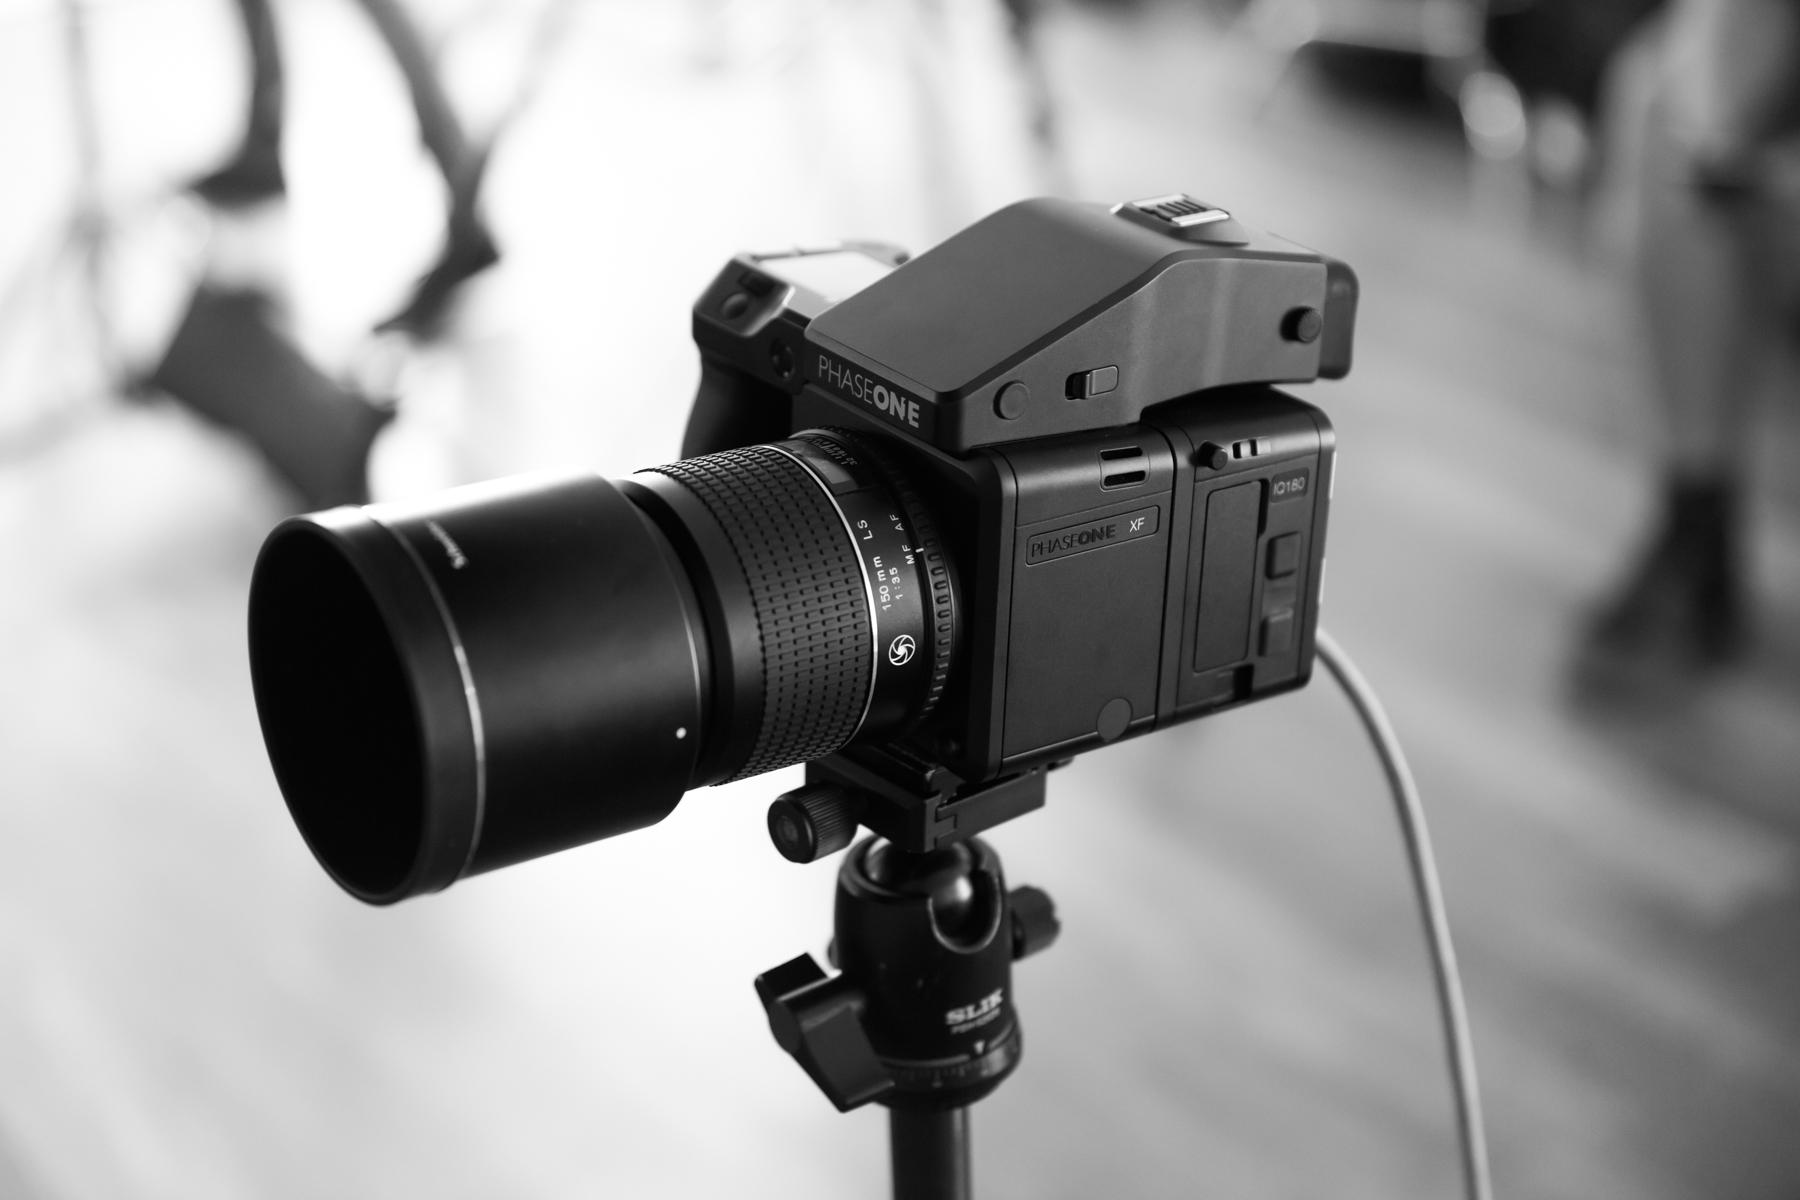 Phoenix Photography gear rentals